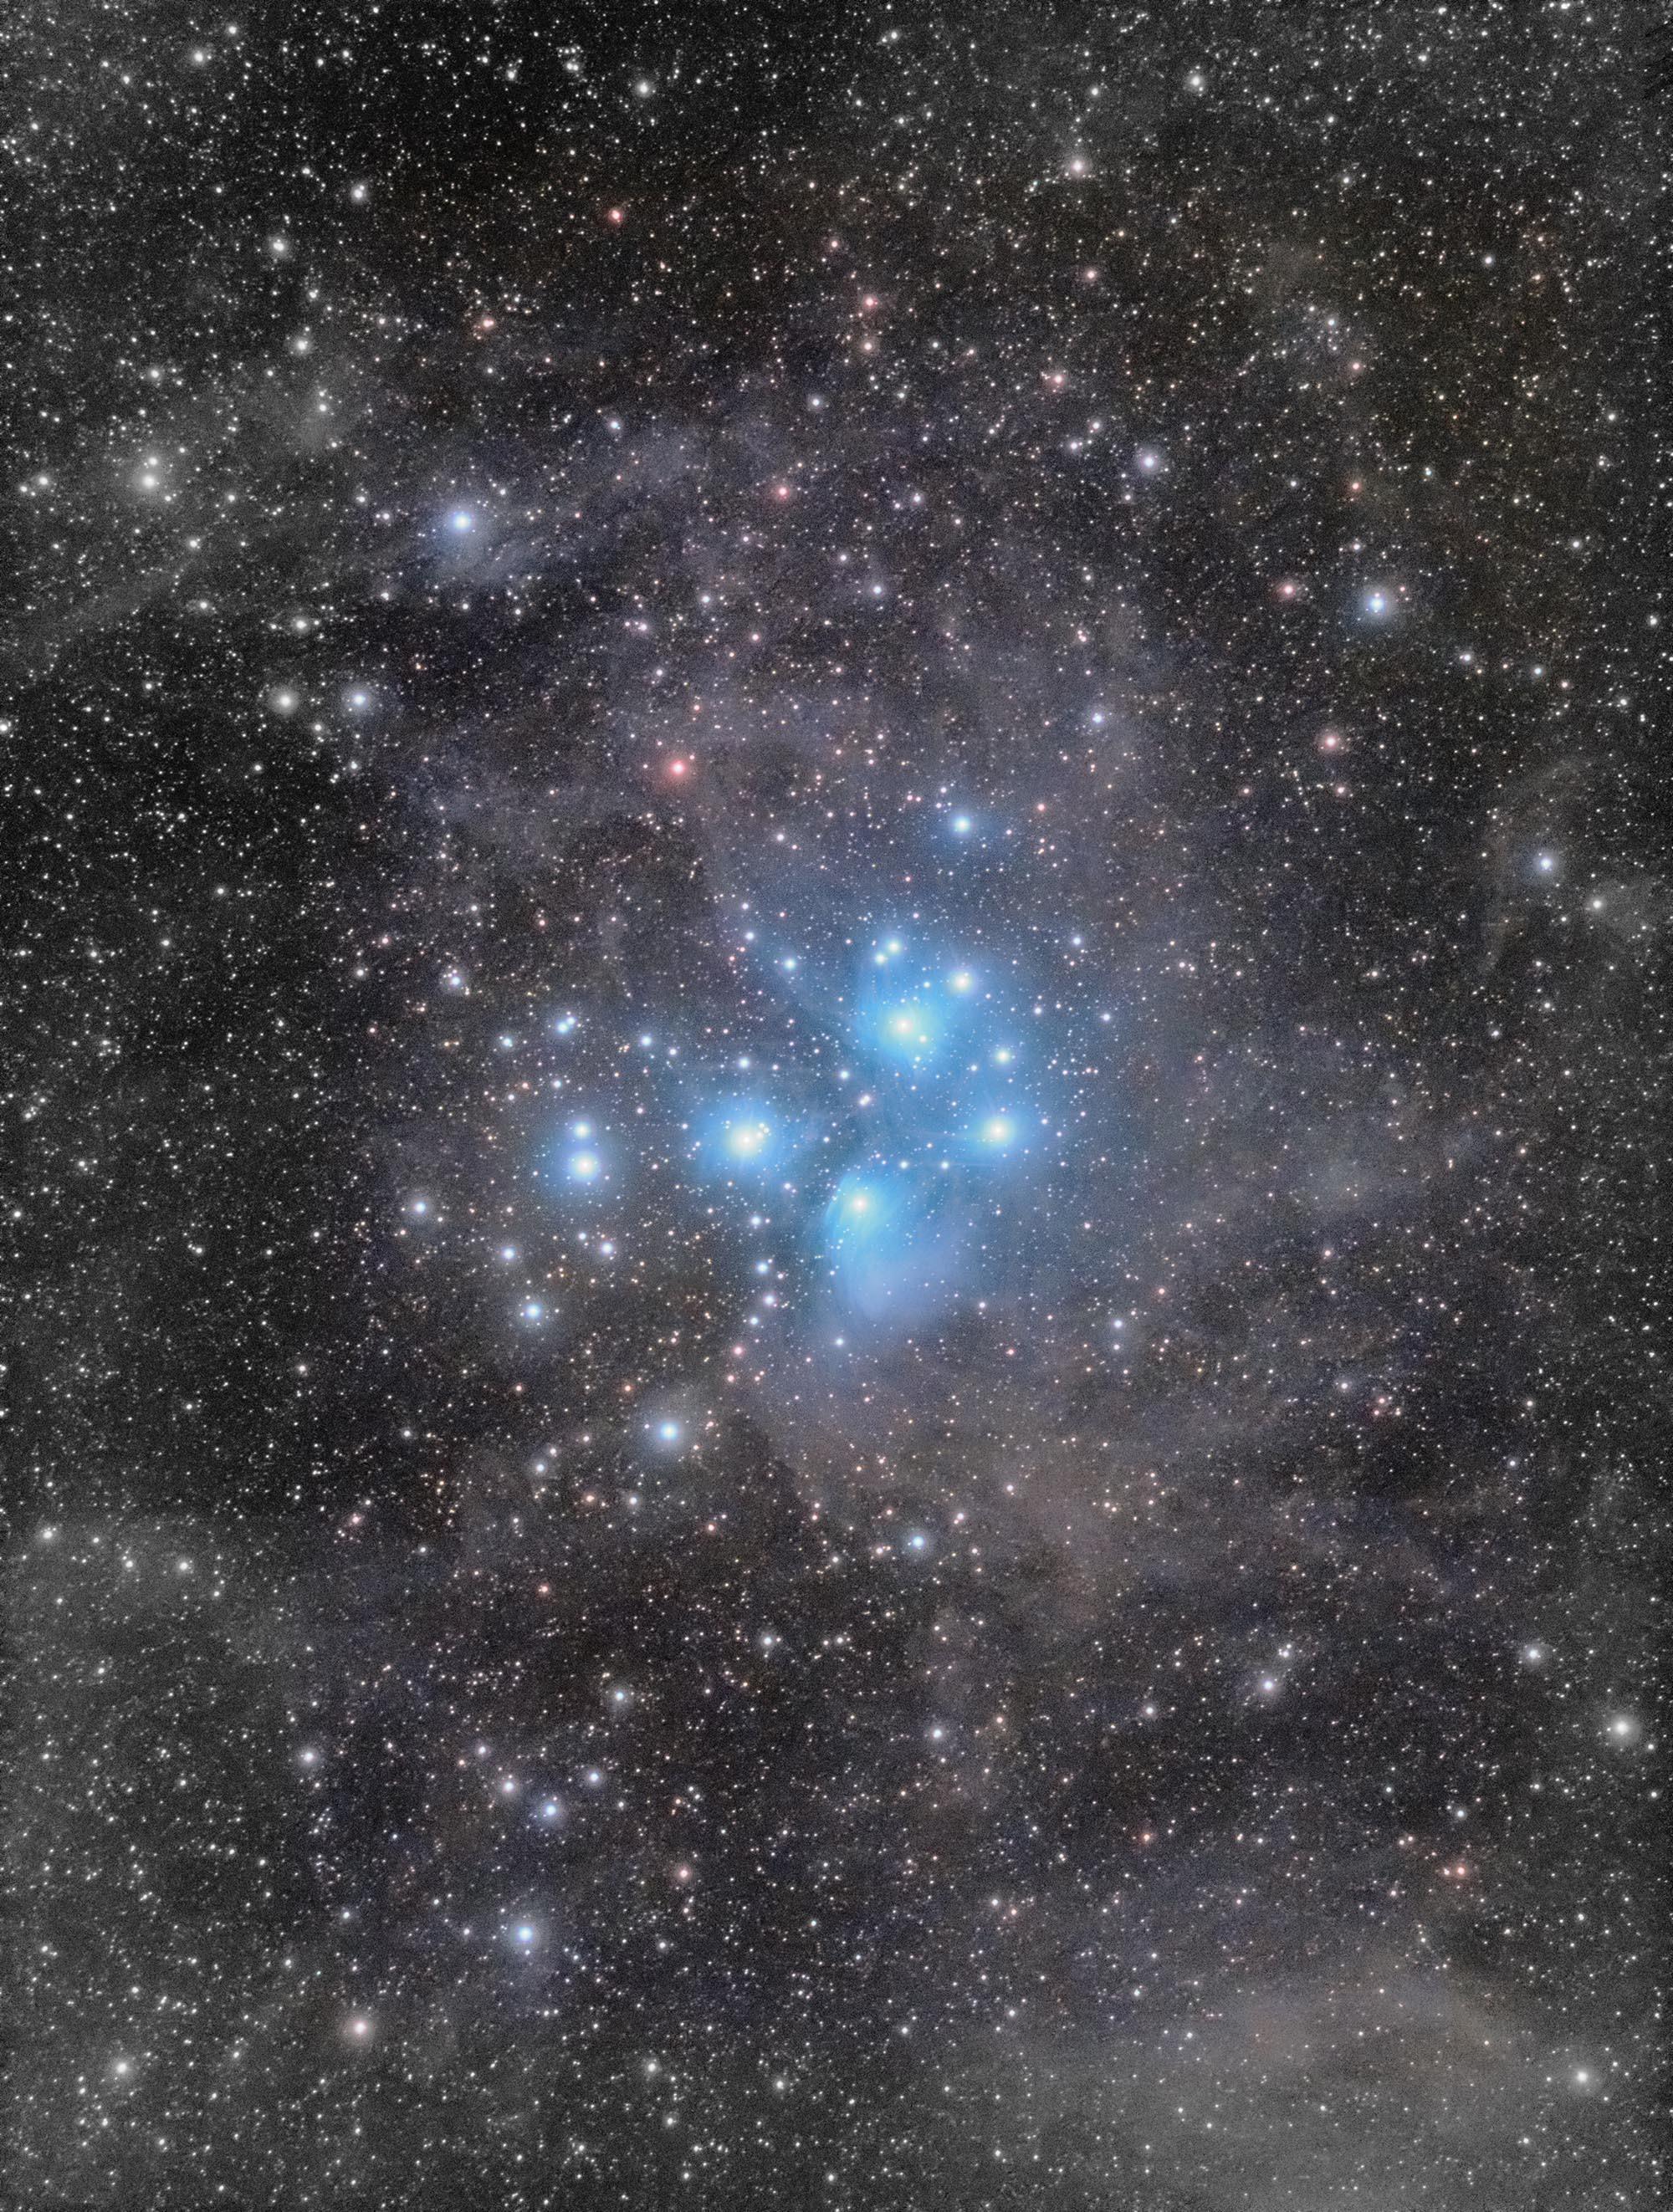 M45 010930